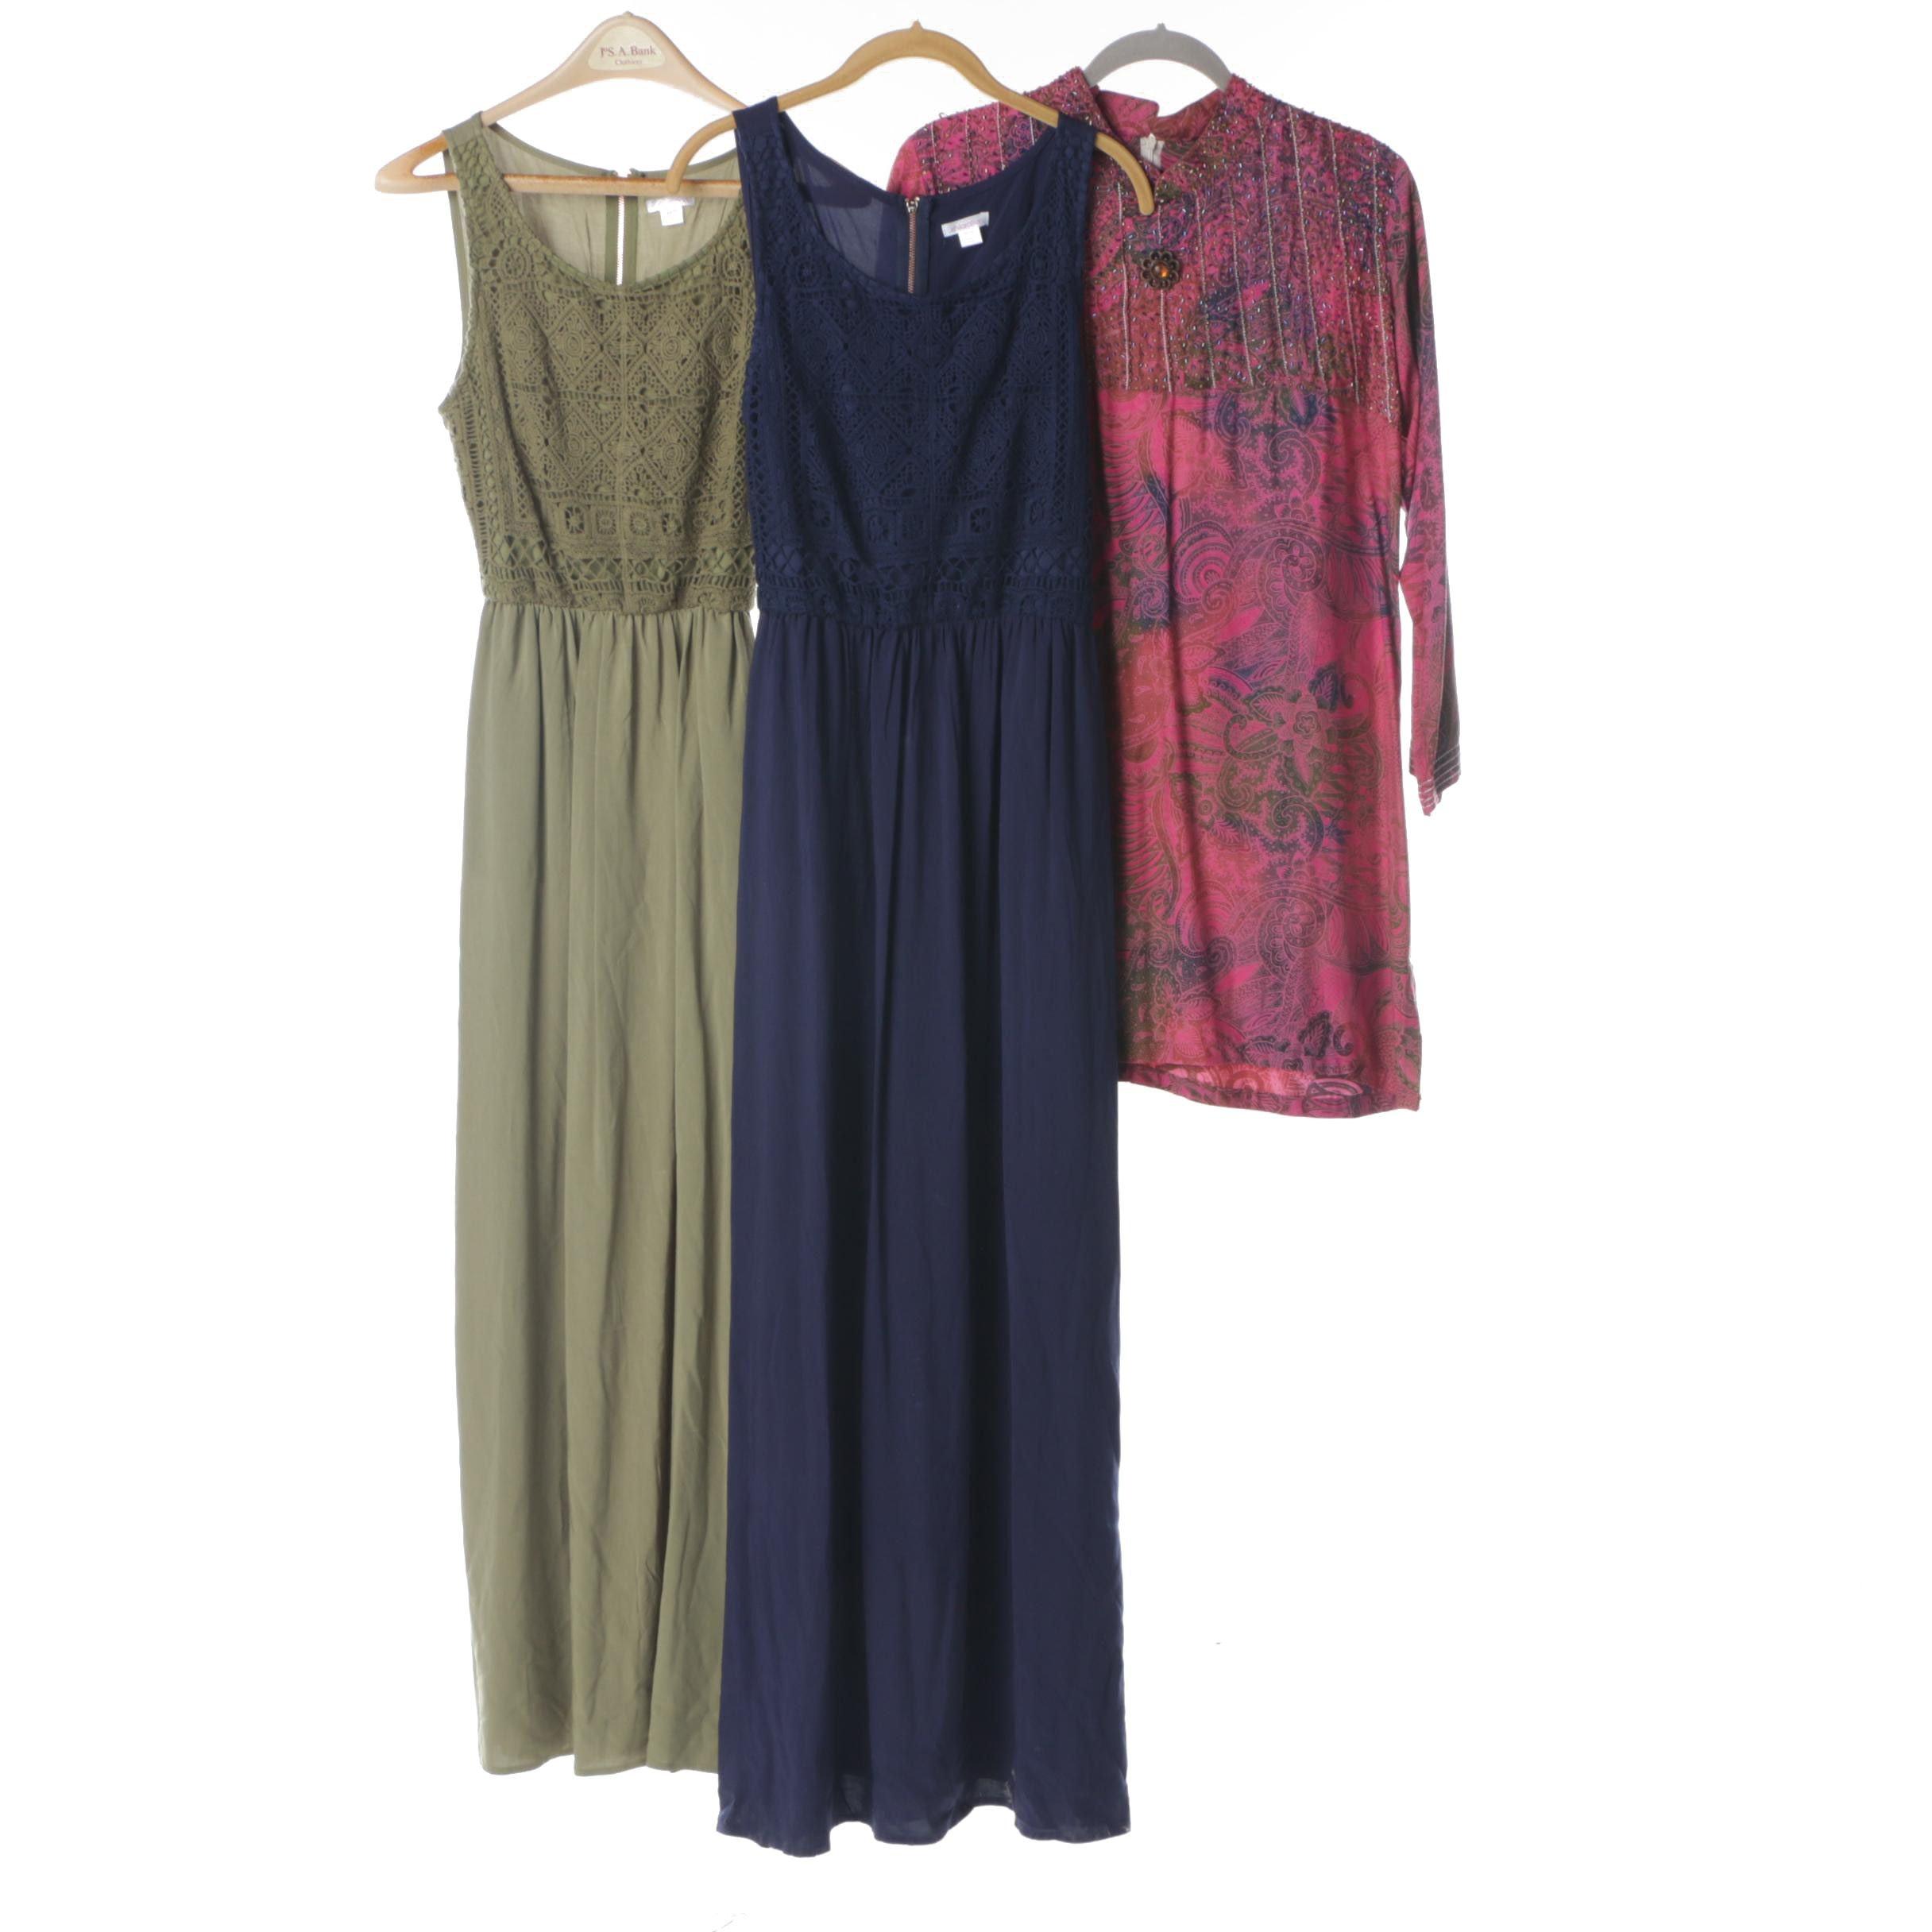 Women's Dresses Including Xhilaration